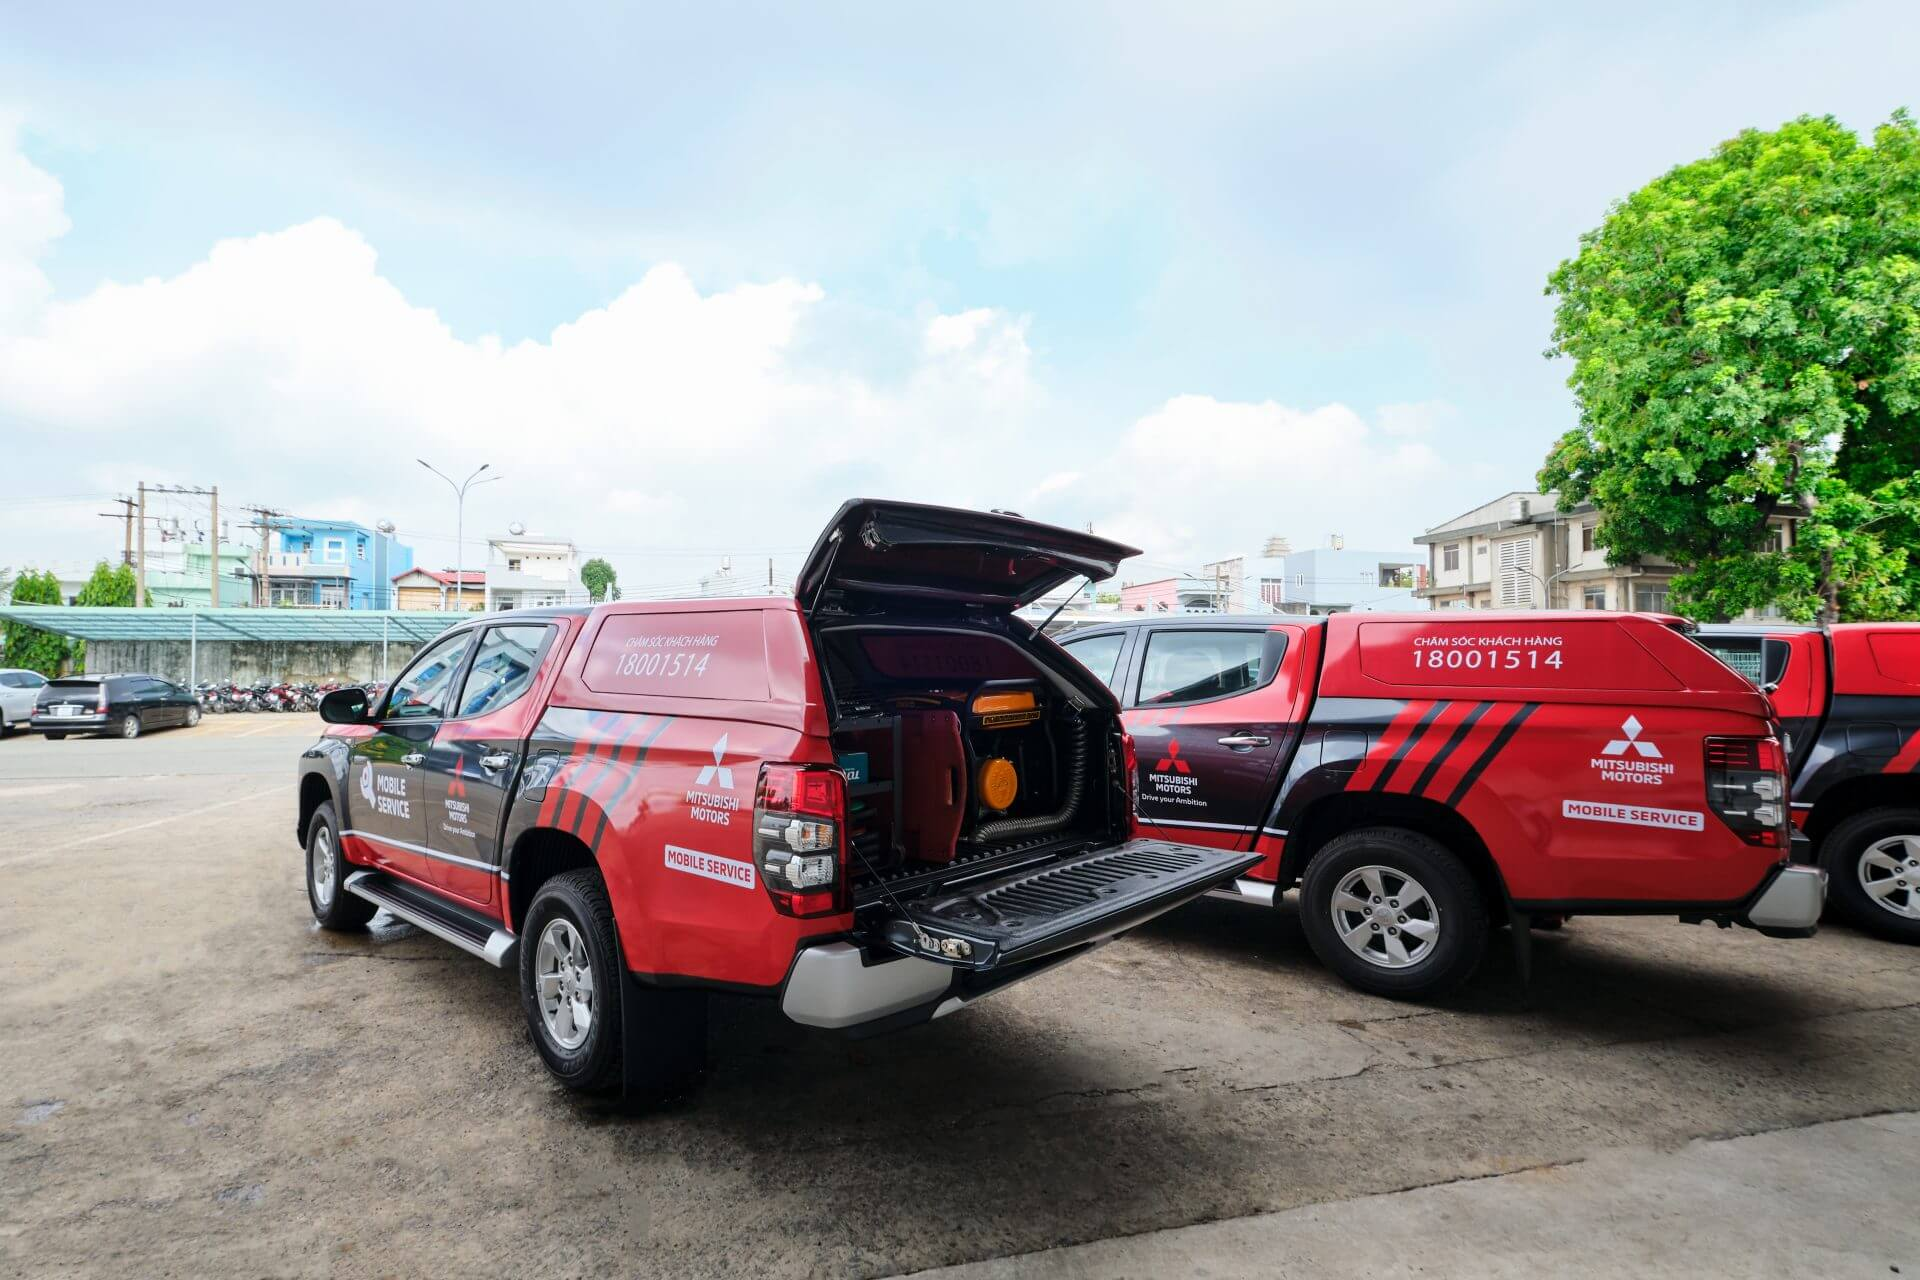 MITSUBISHI MOTORS VIETNAM INTRODUCES MOBILE SERVICE FOR CUSTOMERS |  Mitsubishi Motors Viet Nam